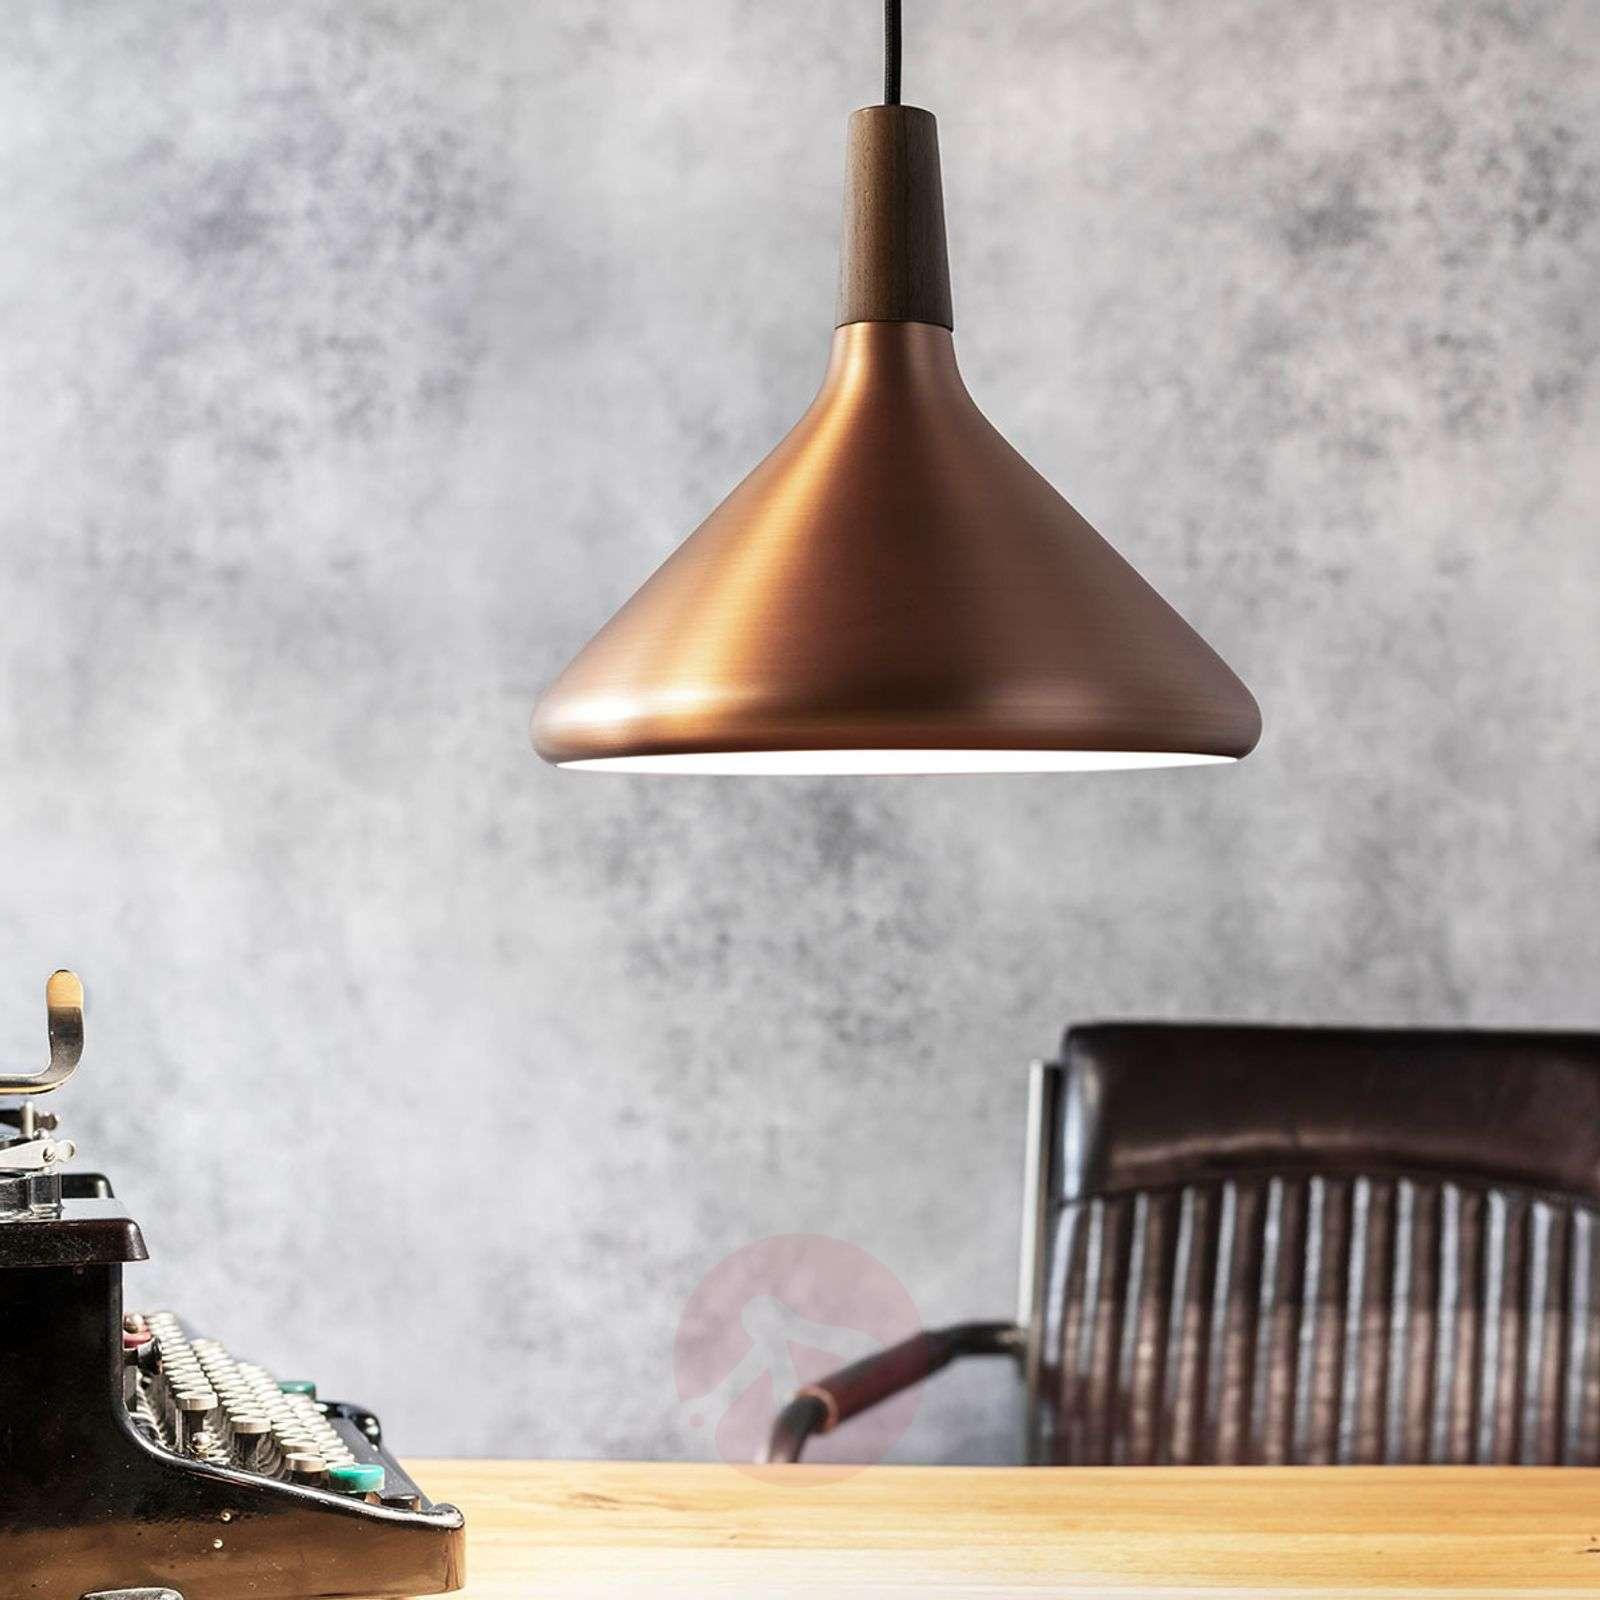 27 cm copper coloured pendant lamp Float-7005902-03